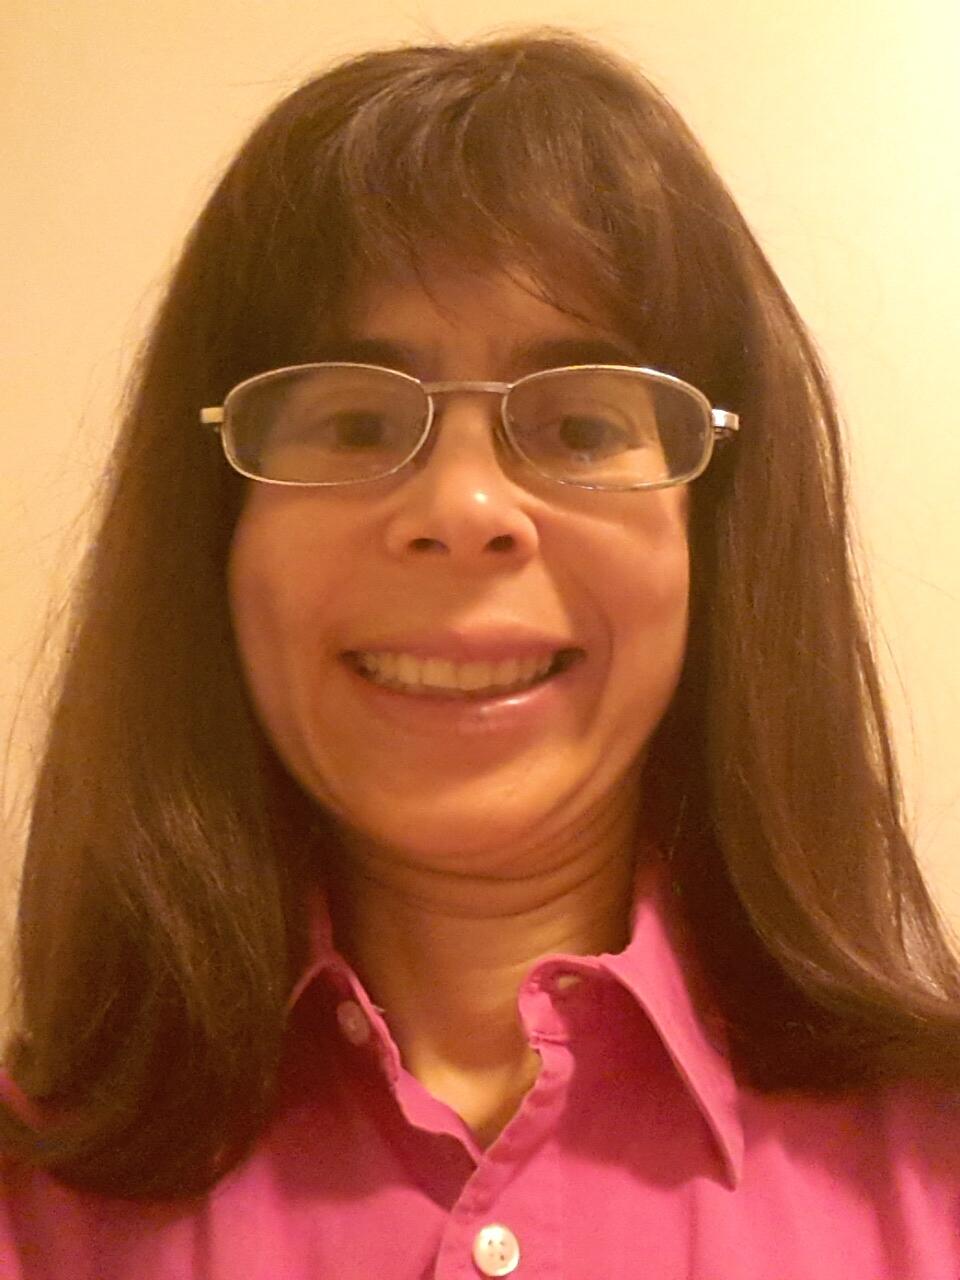 Dr. Ilana Slaff